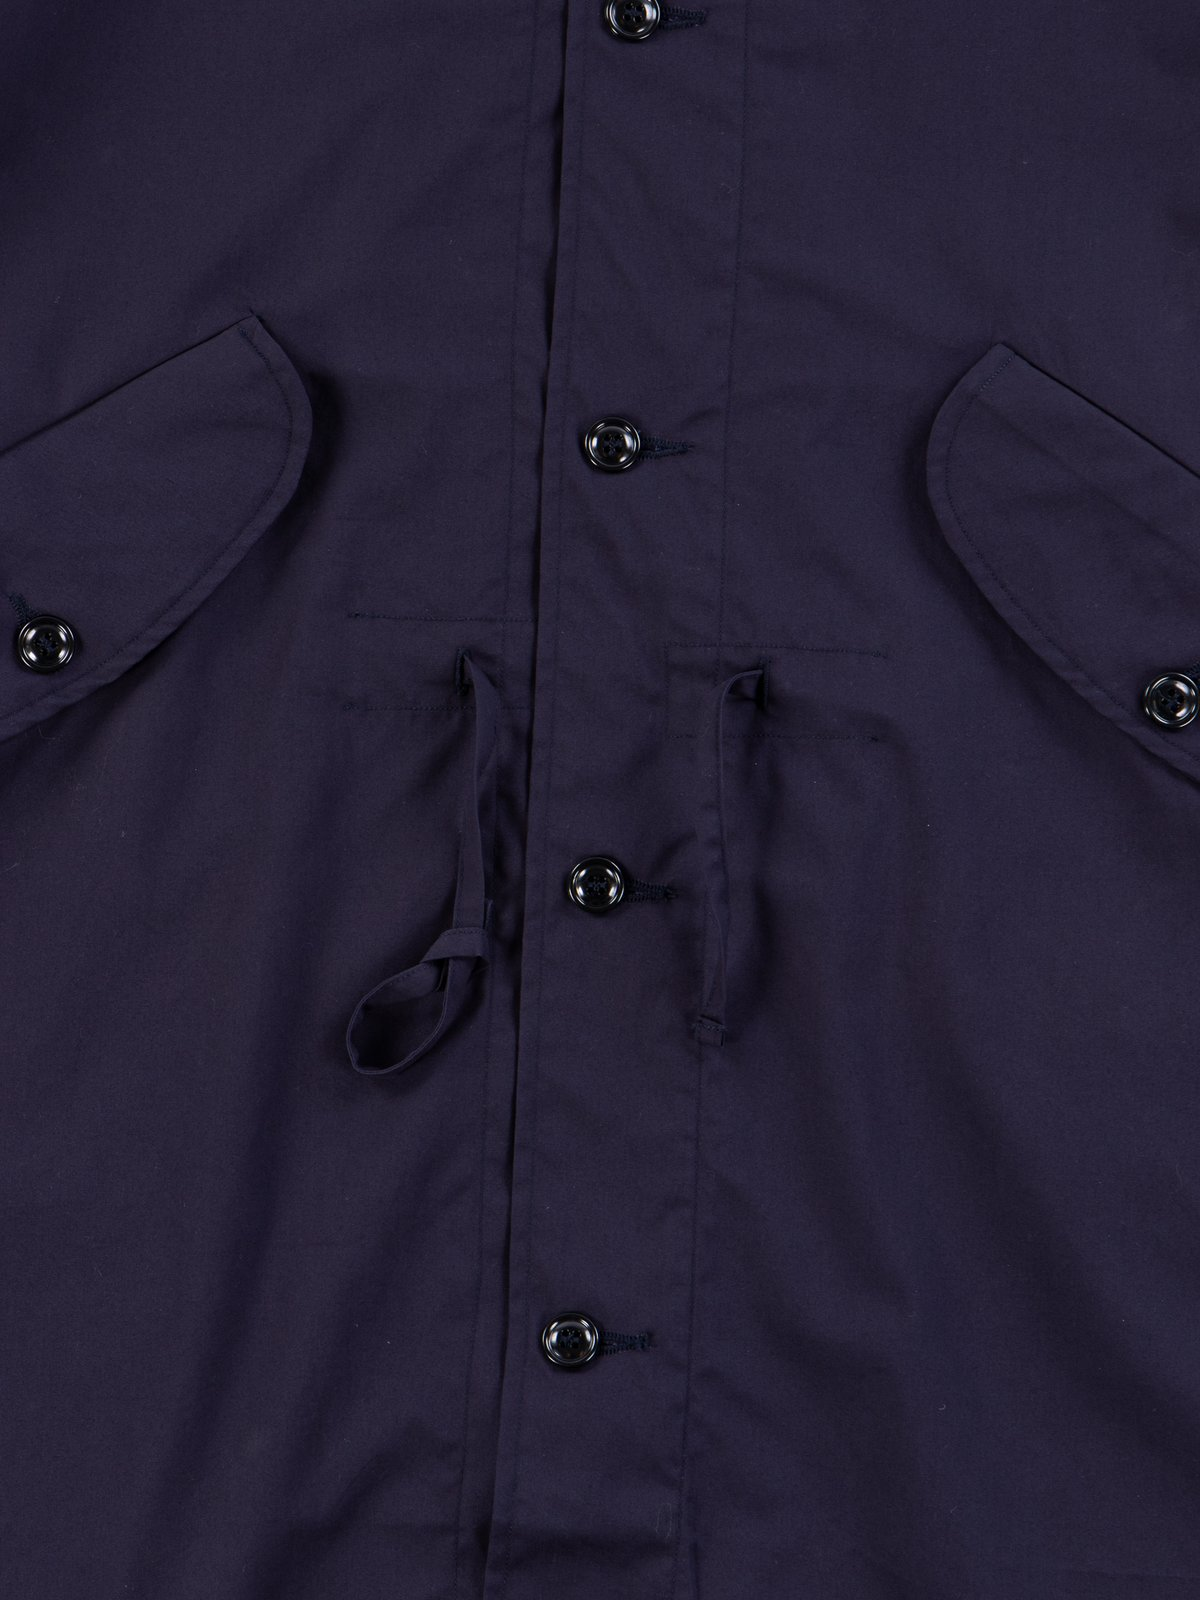 Navy Oxford Vancloth Czech Coat - Image 4